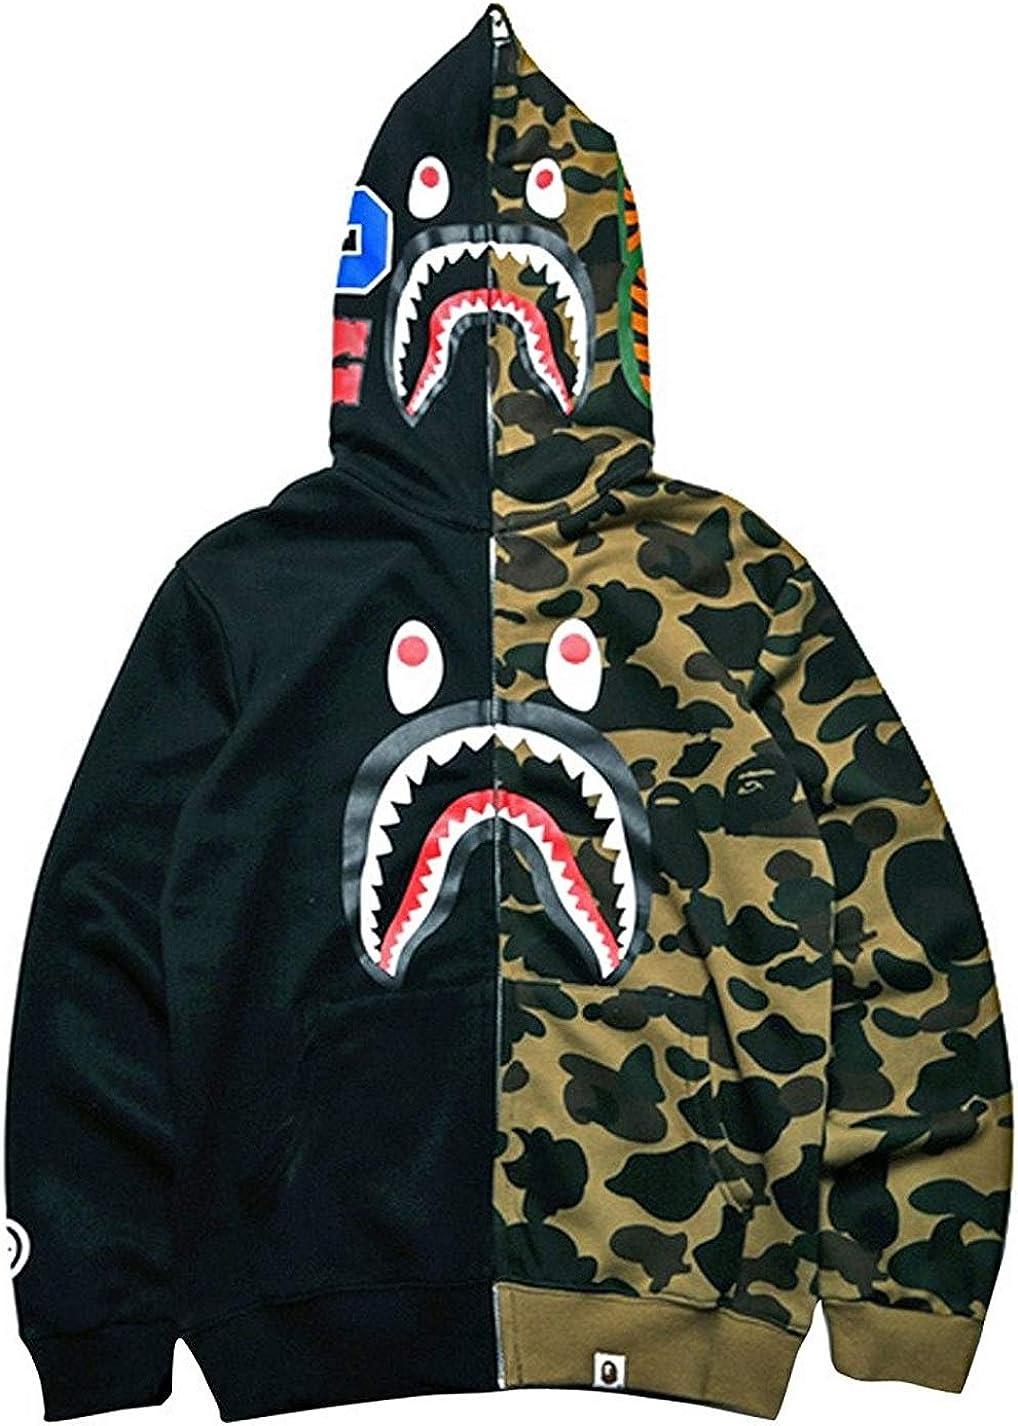 Big Mouth Shark Ape Bape Camo Mens Women Hoodies Sweatershirt Casual Zip Up Hip-Hop Funny Tops